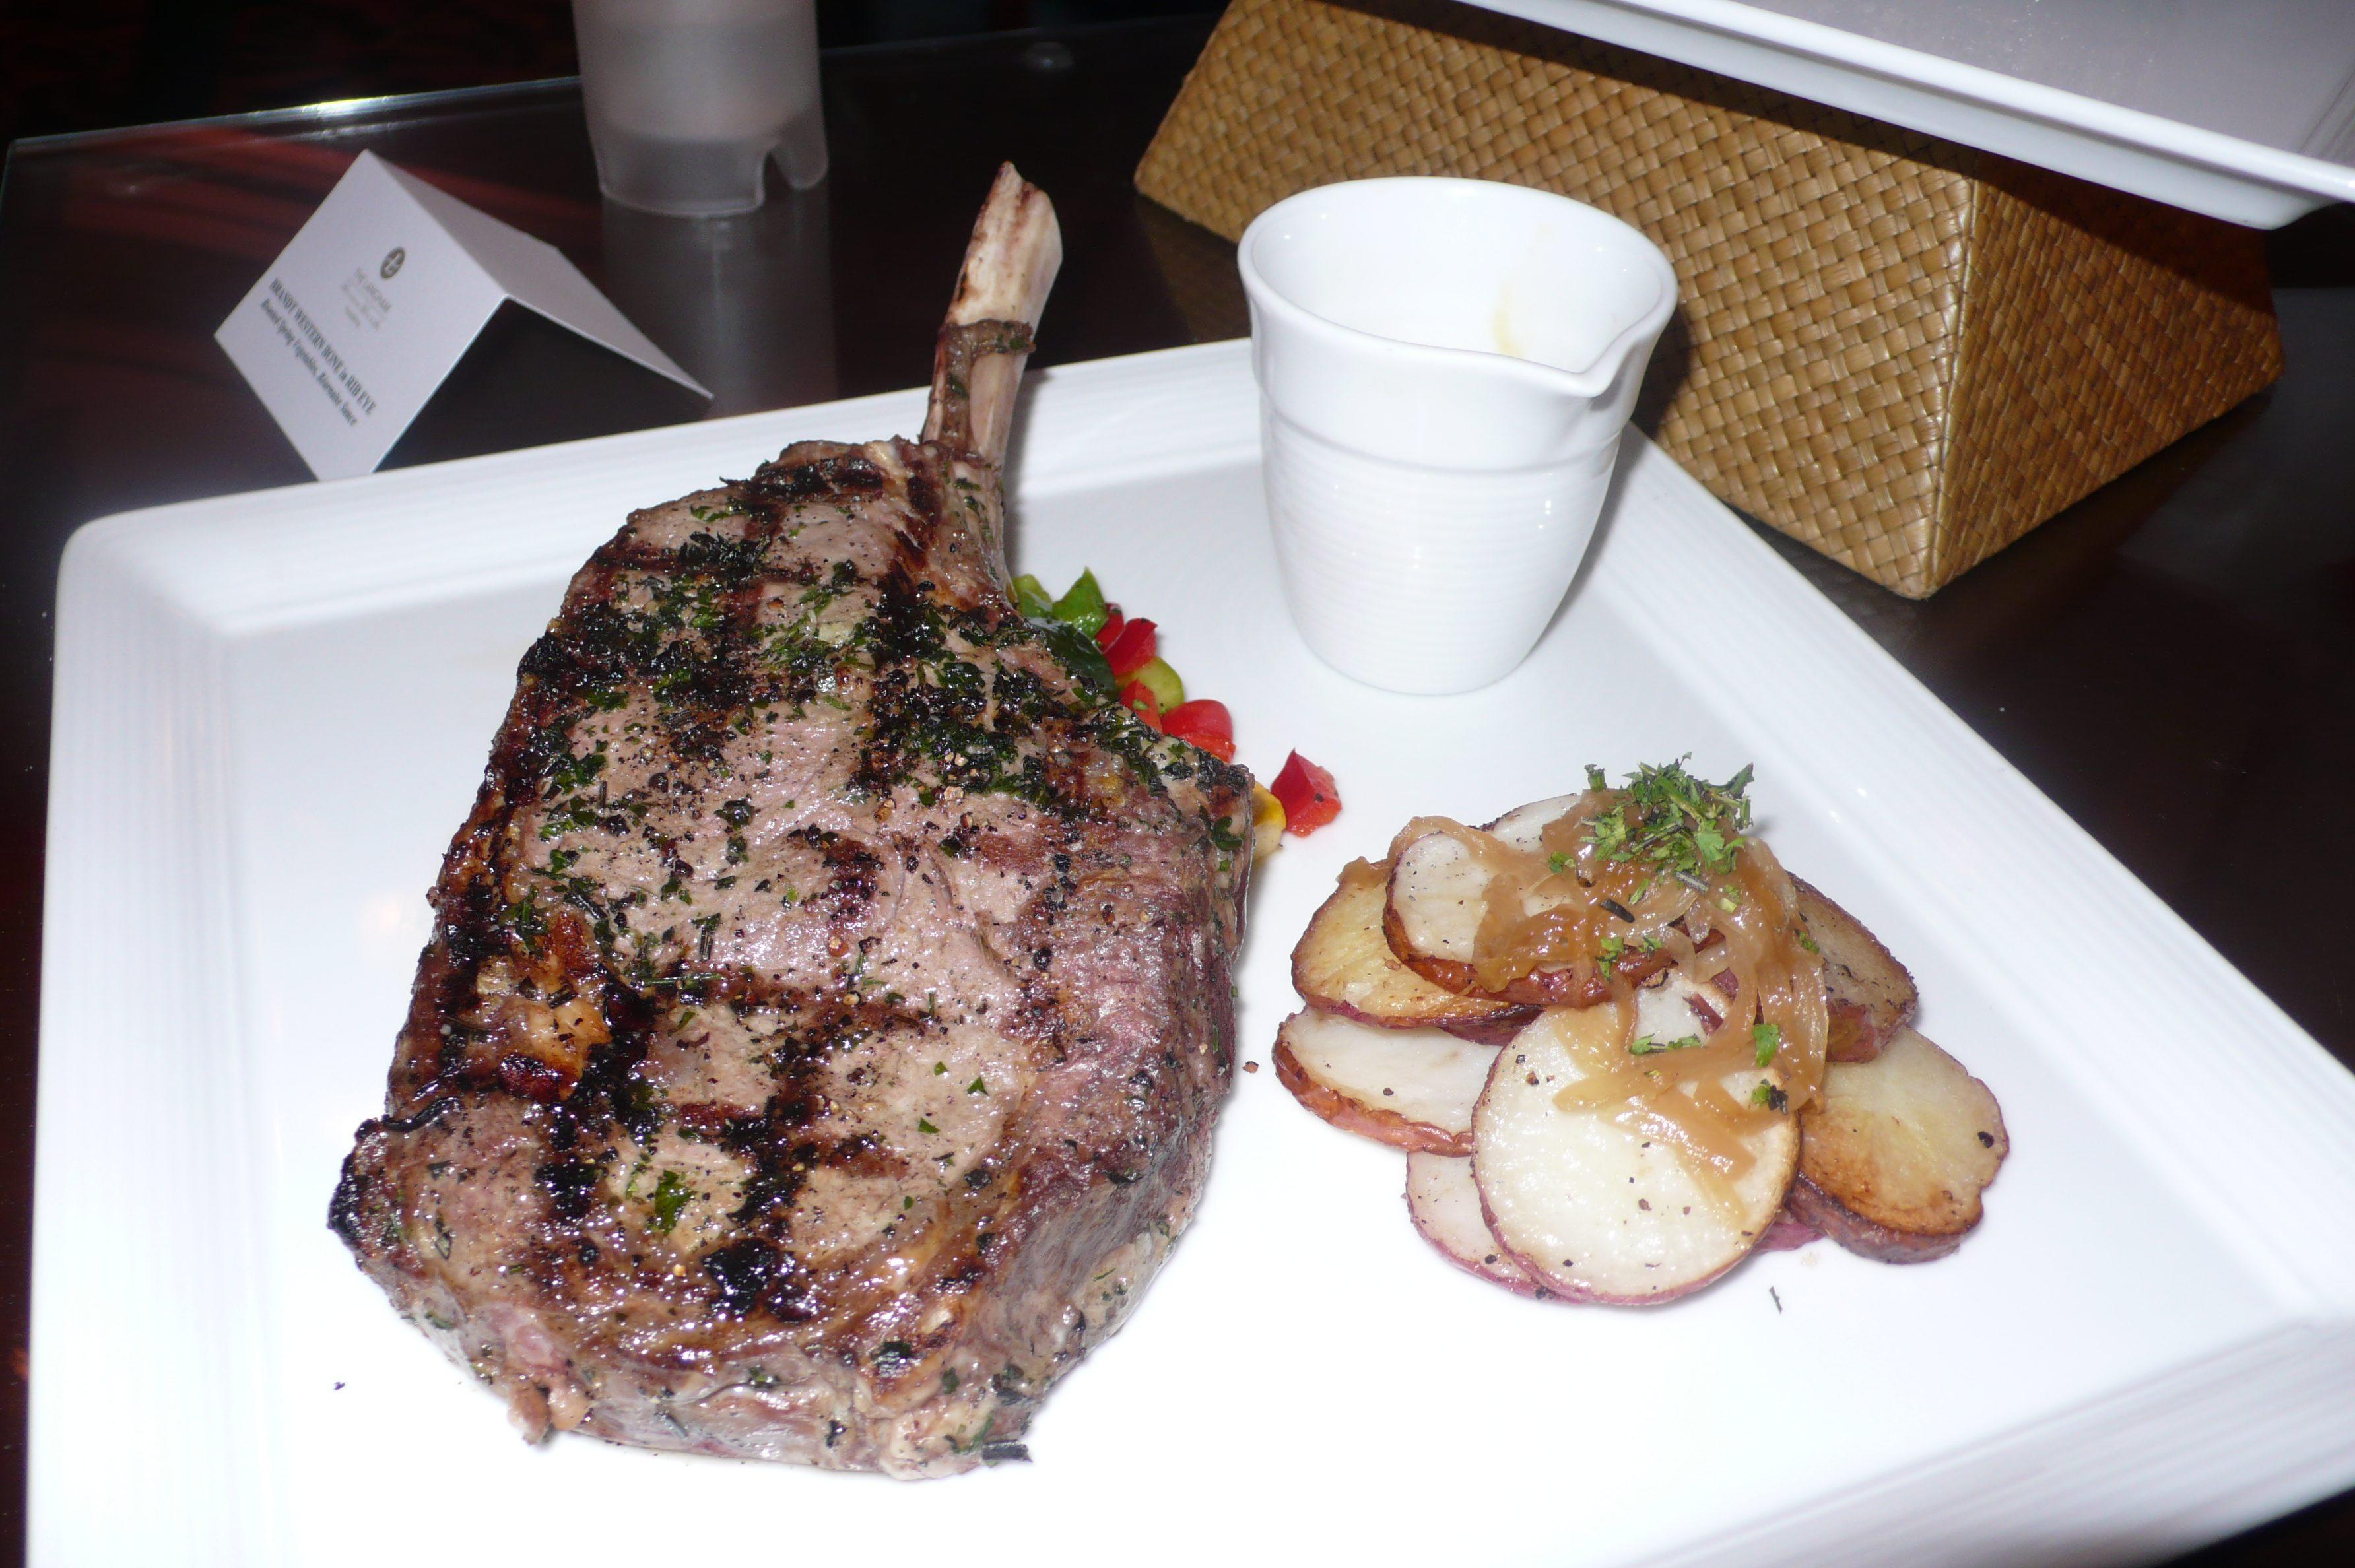 Western bone-in rib eye with roasted veggies and bearnaise sauce